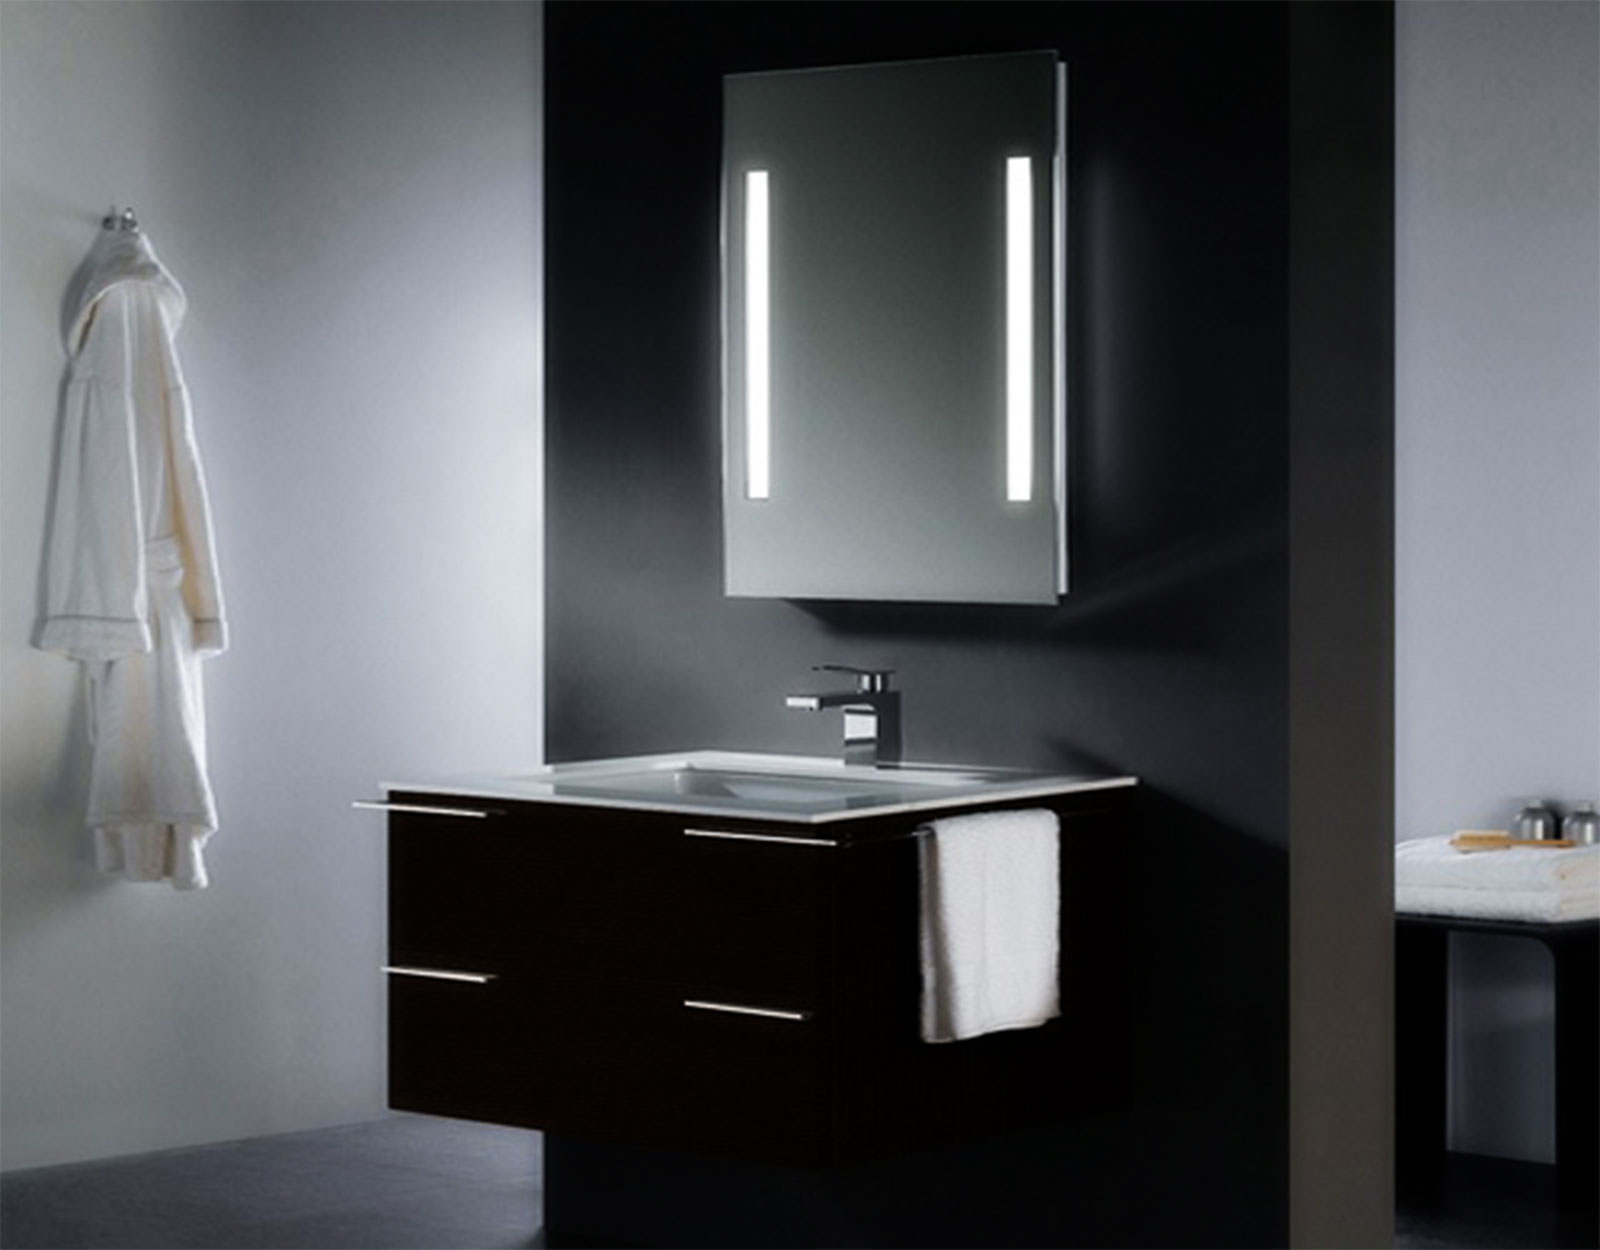 lit bathroom mirror cabinets bathroom mirrors and mirror cabinets: dwell bathroom cabinet